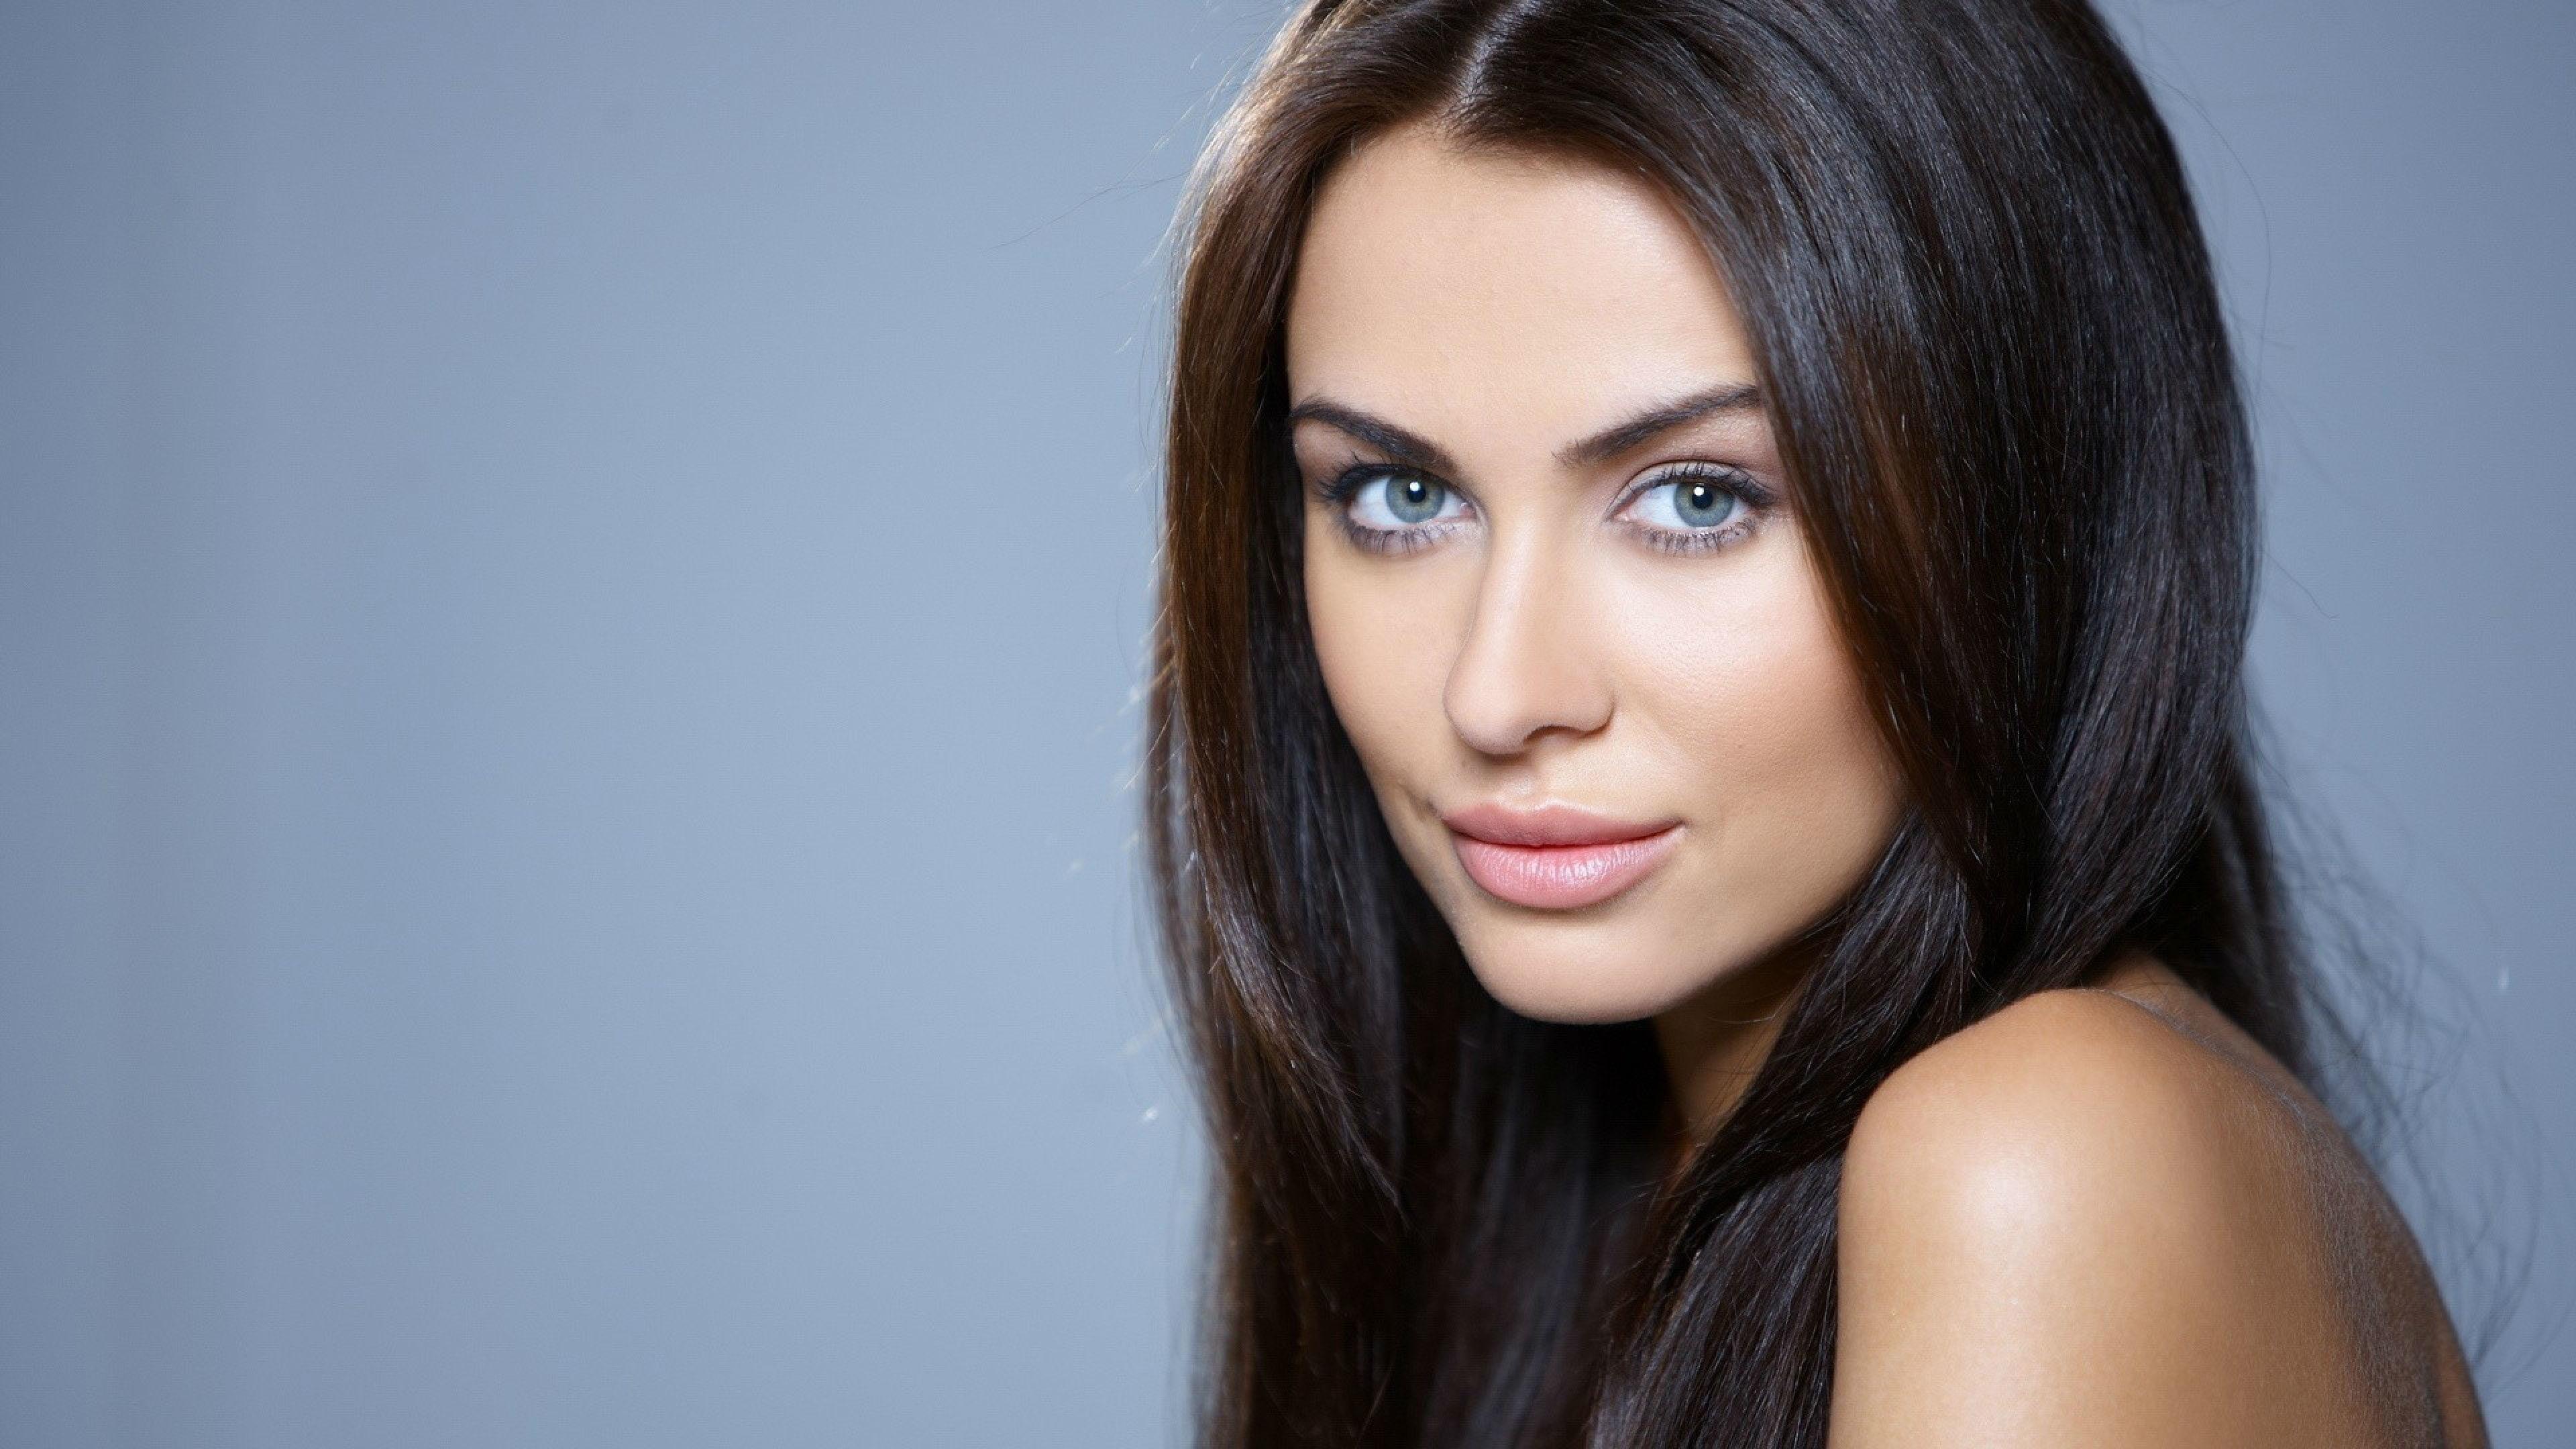 … Beautiful Face wallpaper | wallpaper free download